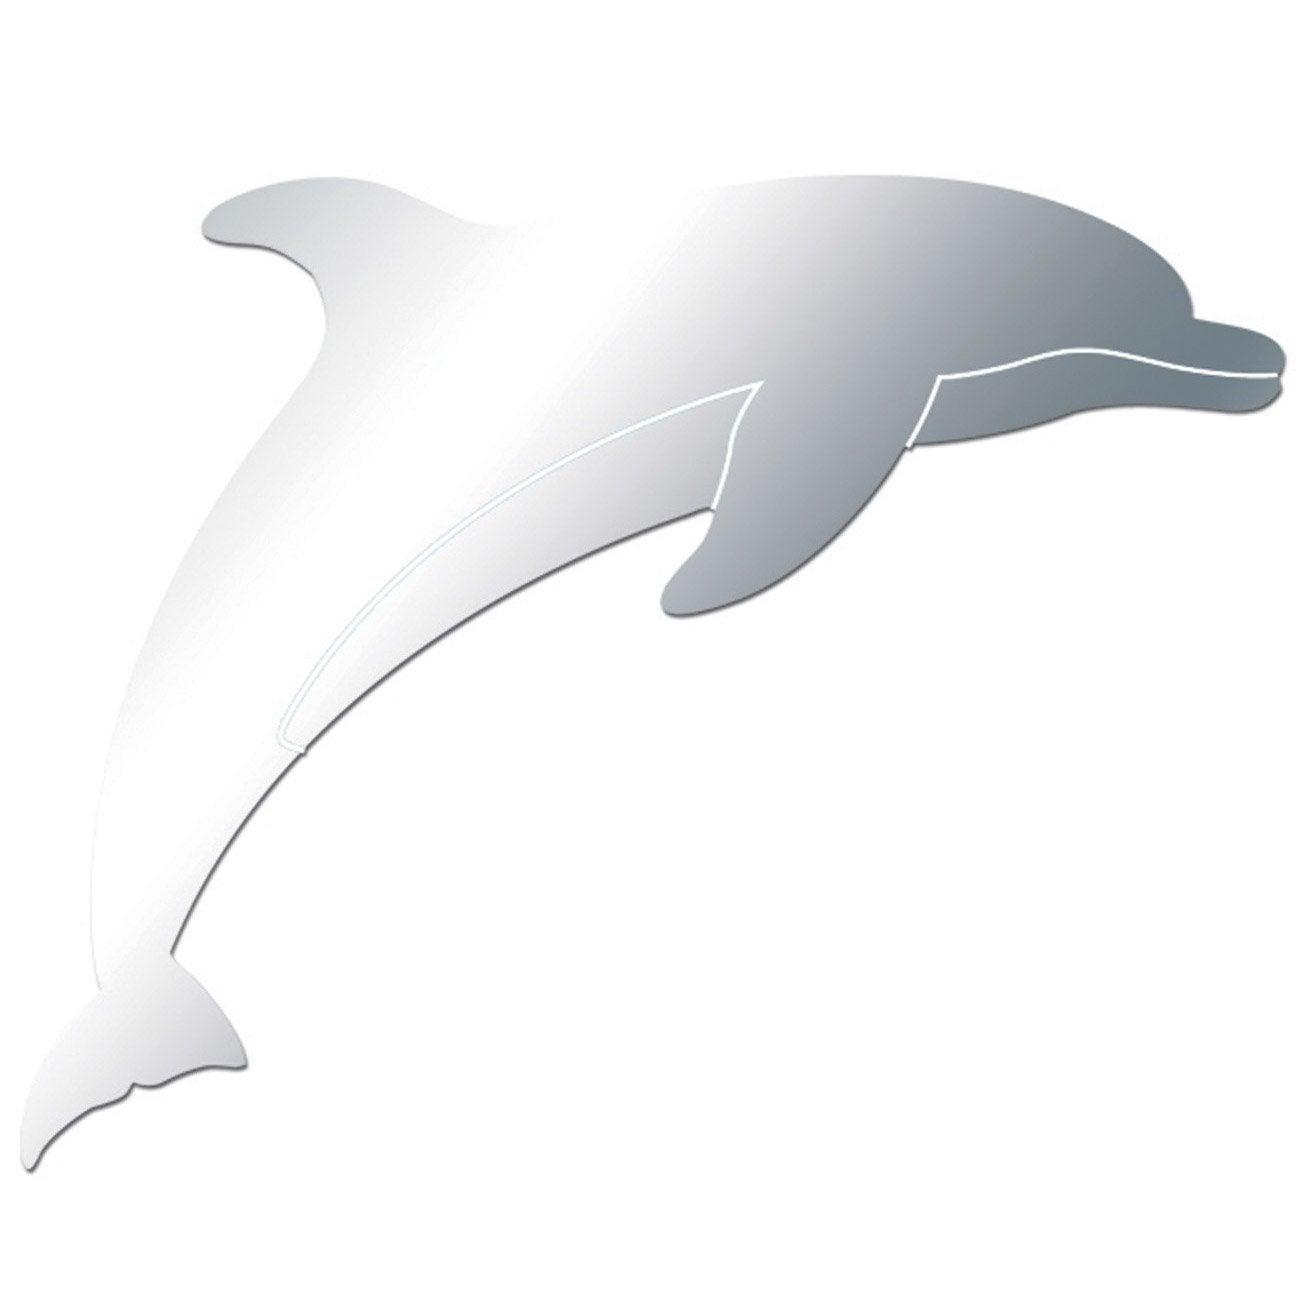 Miroir en plexiglass dauphin 10 cm x 10 cm leroy merlin - Vitre plexiglas leroy merlin ...